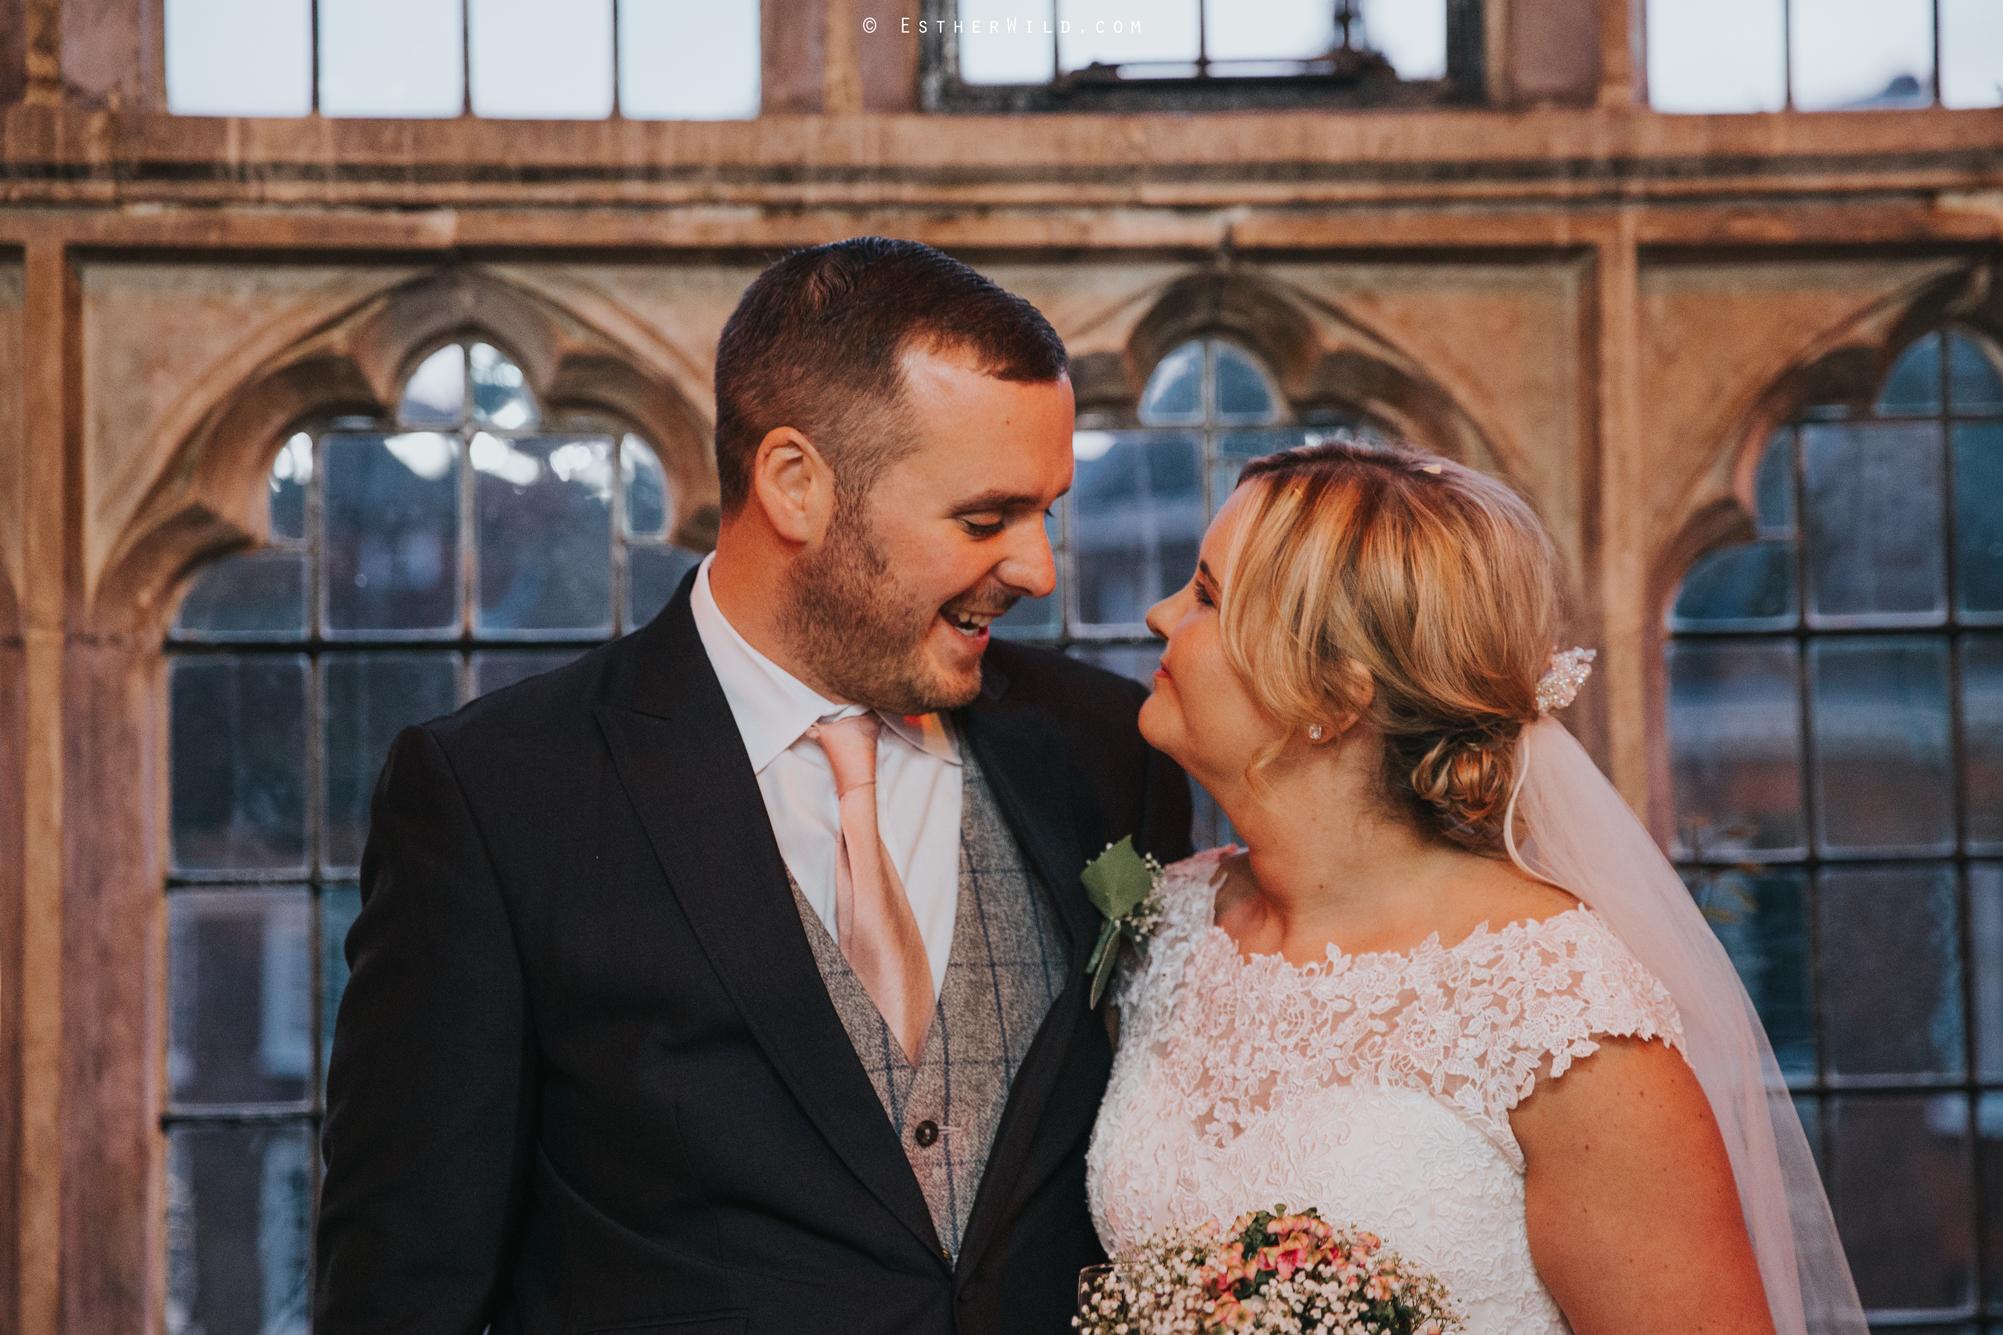 Wedding_Kings_Lynn_Town_Hall_Norfolk_Photographer_Esther_Wild_IMG_1449.jpg